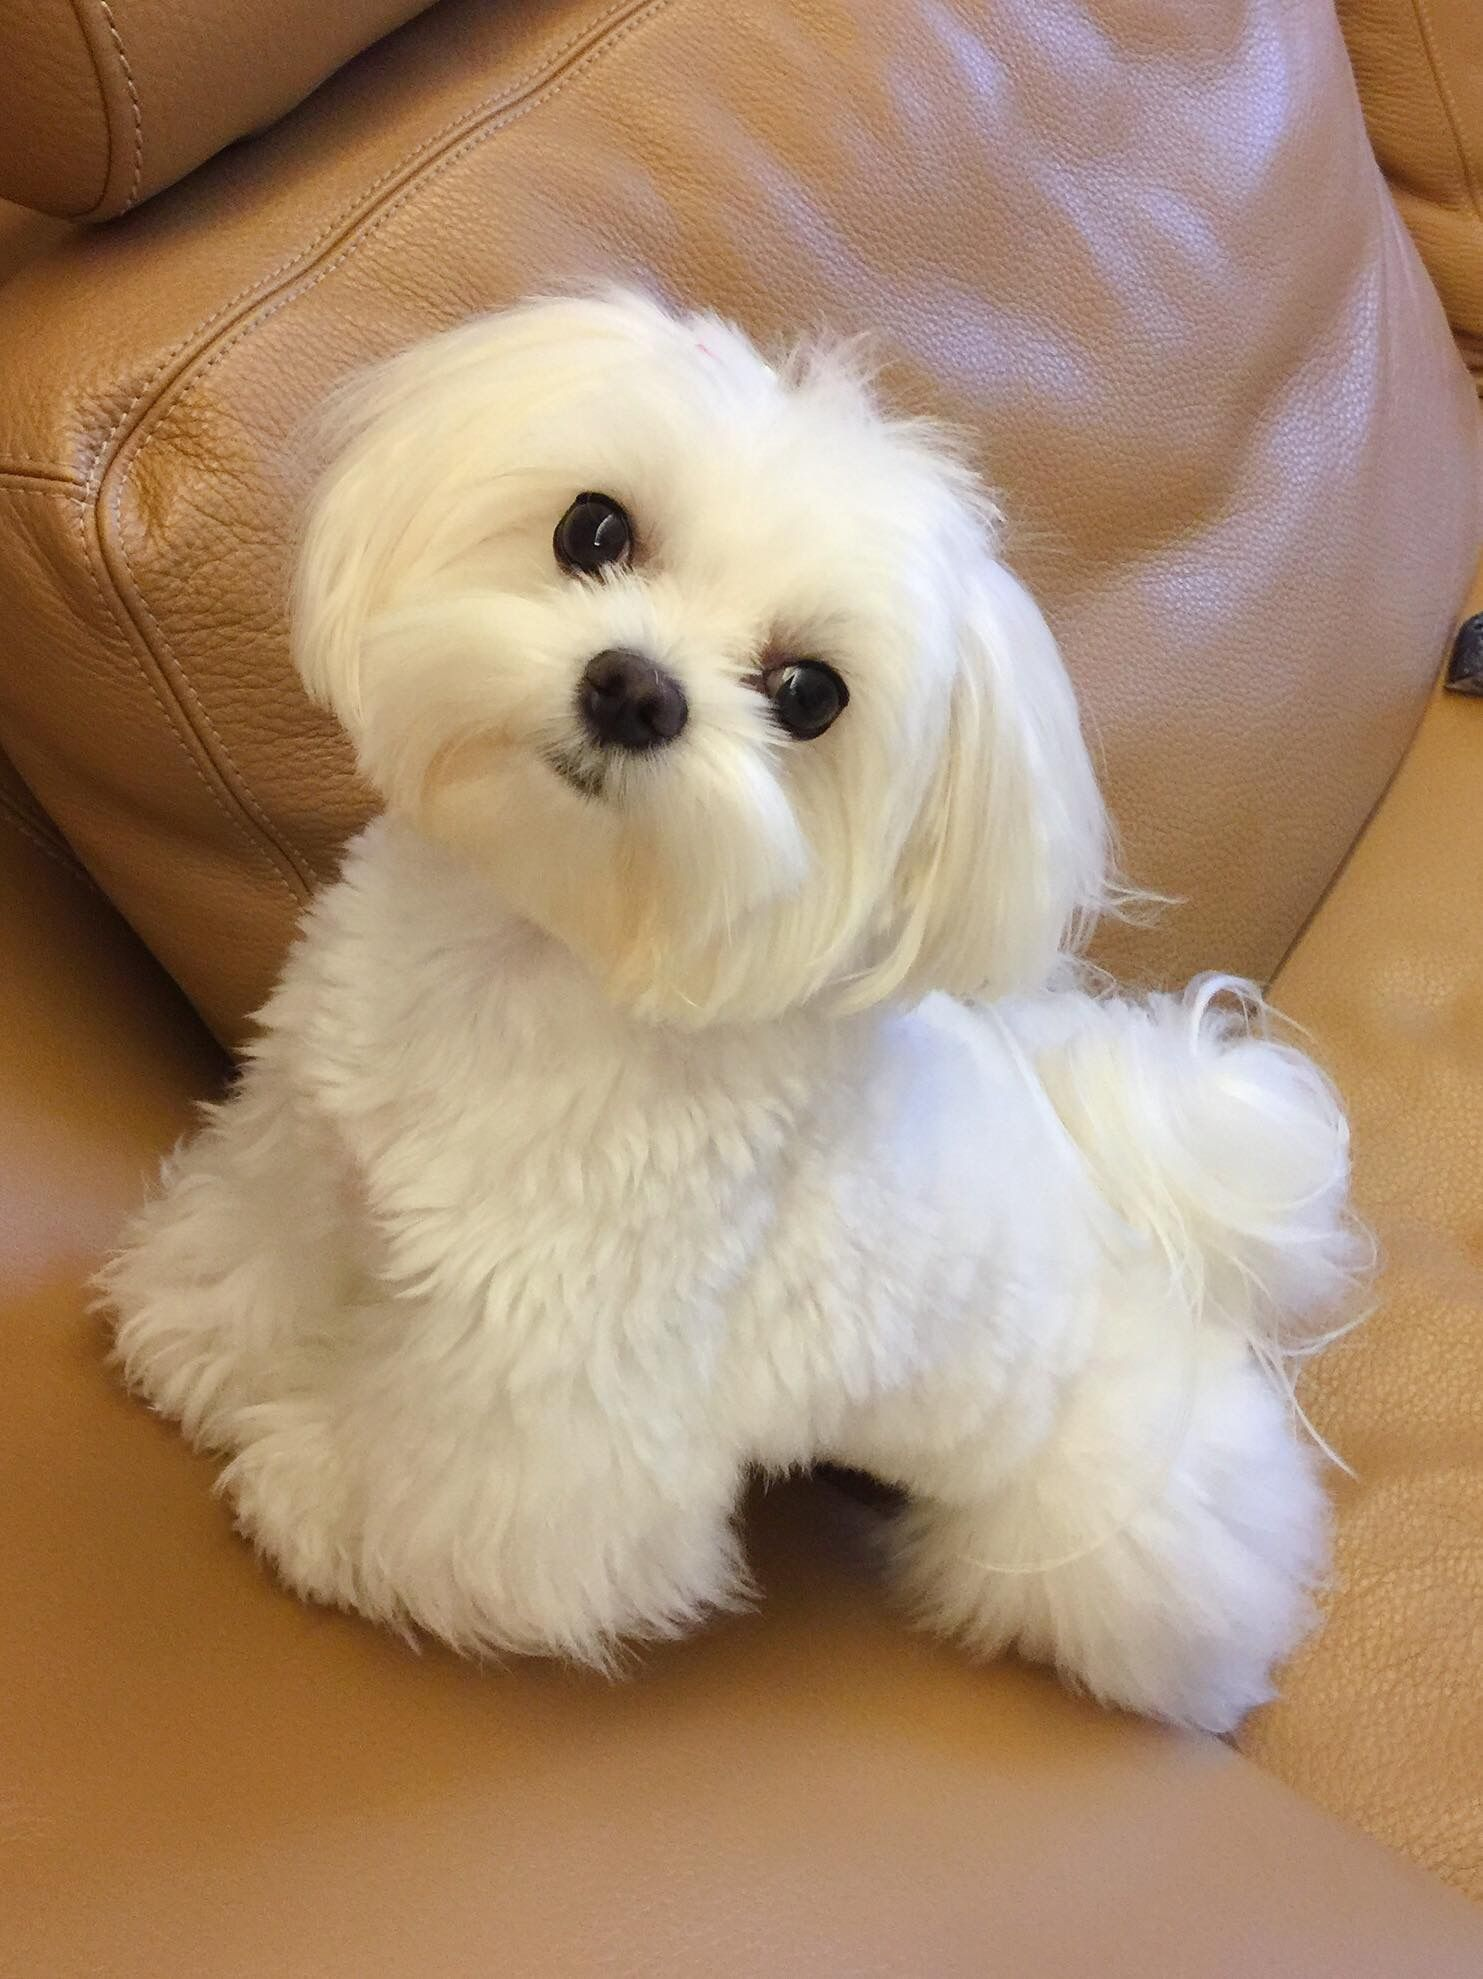 Send Me This Maltese Please Maltese Teacup Puppies Maltese